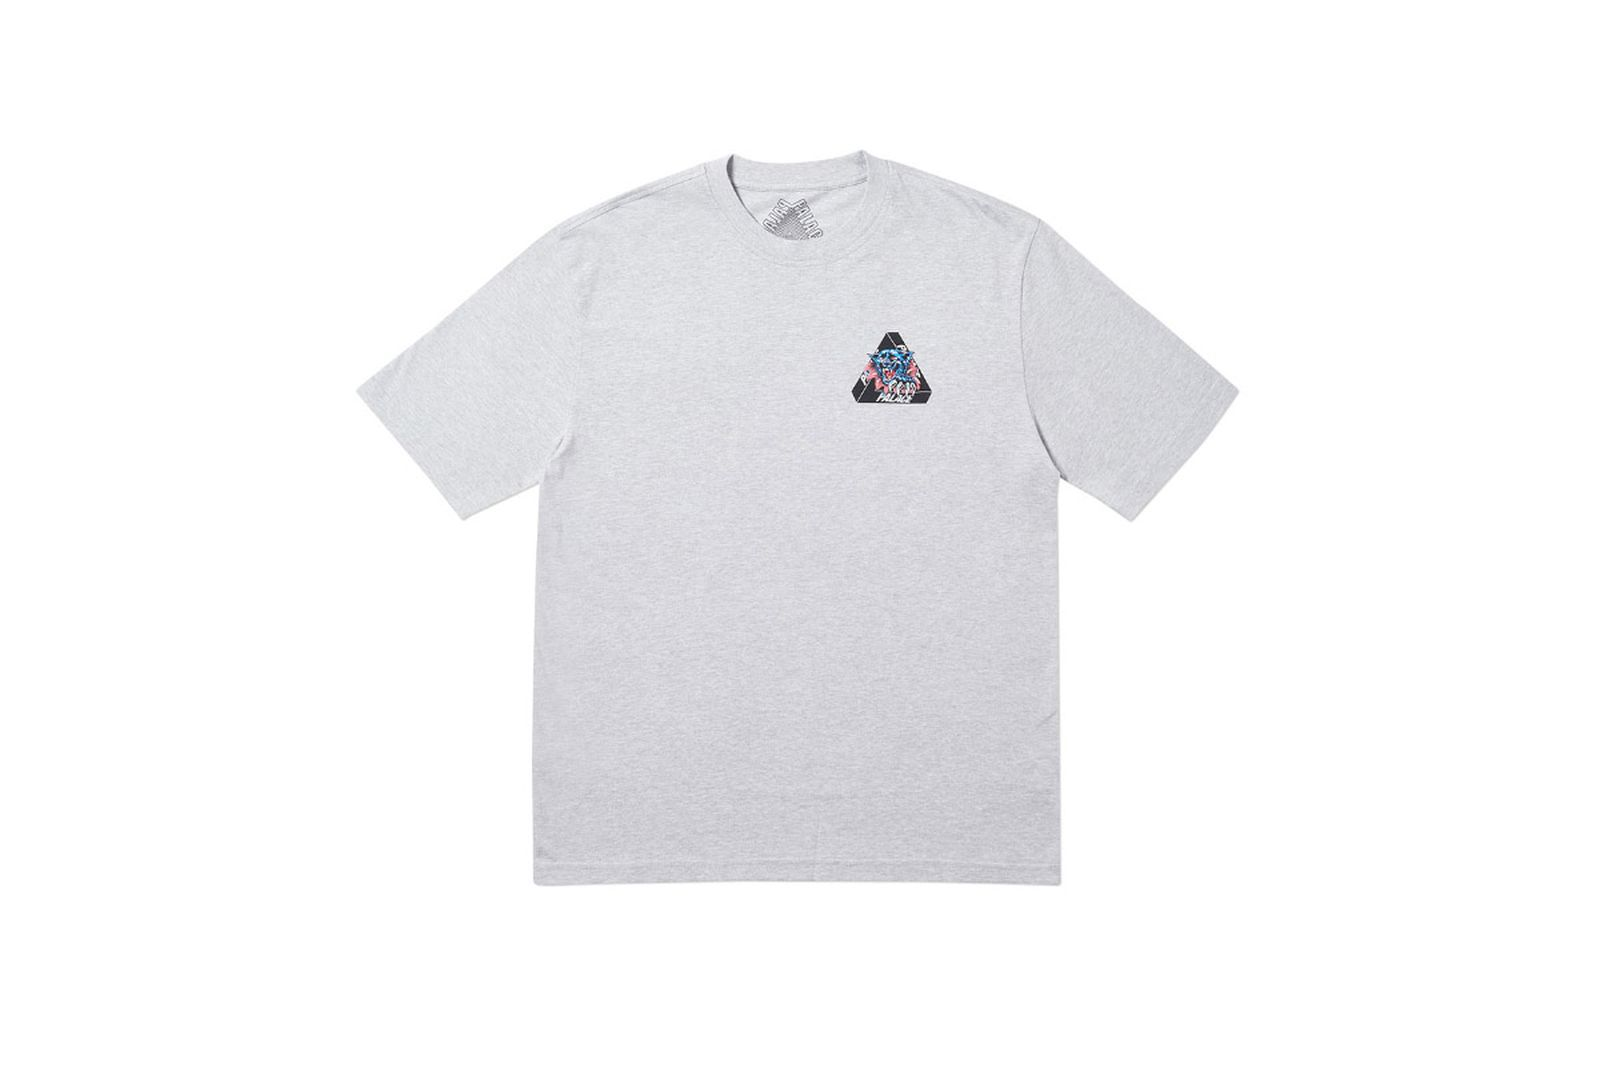 Palace 2019 Autumn T Shirt Ripped grey marl front